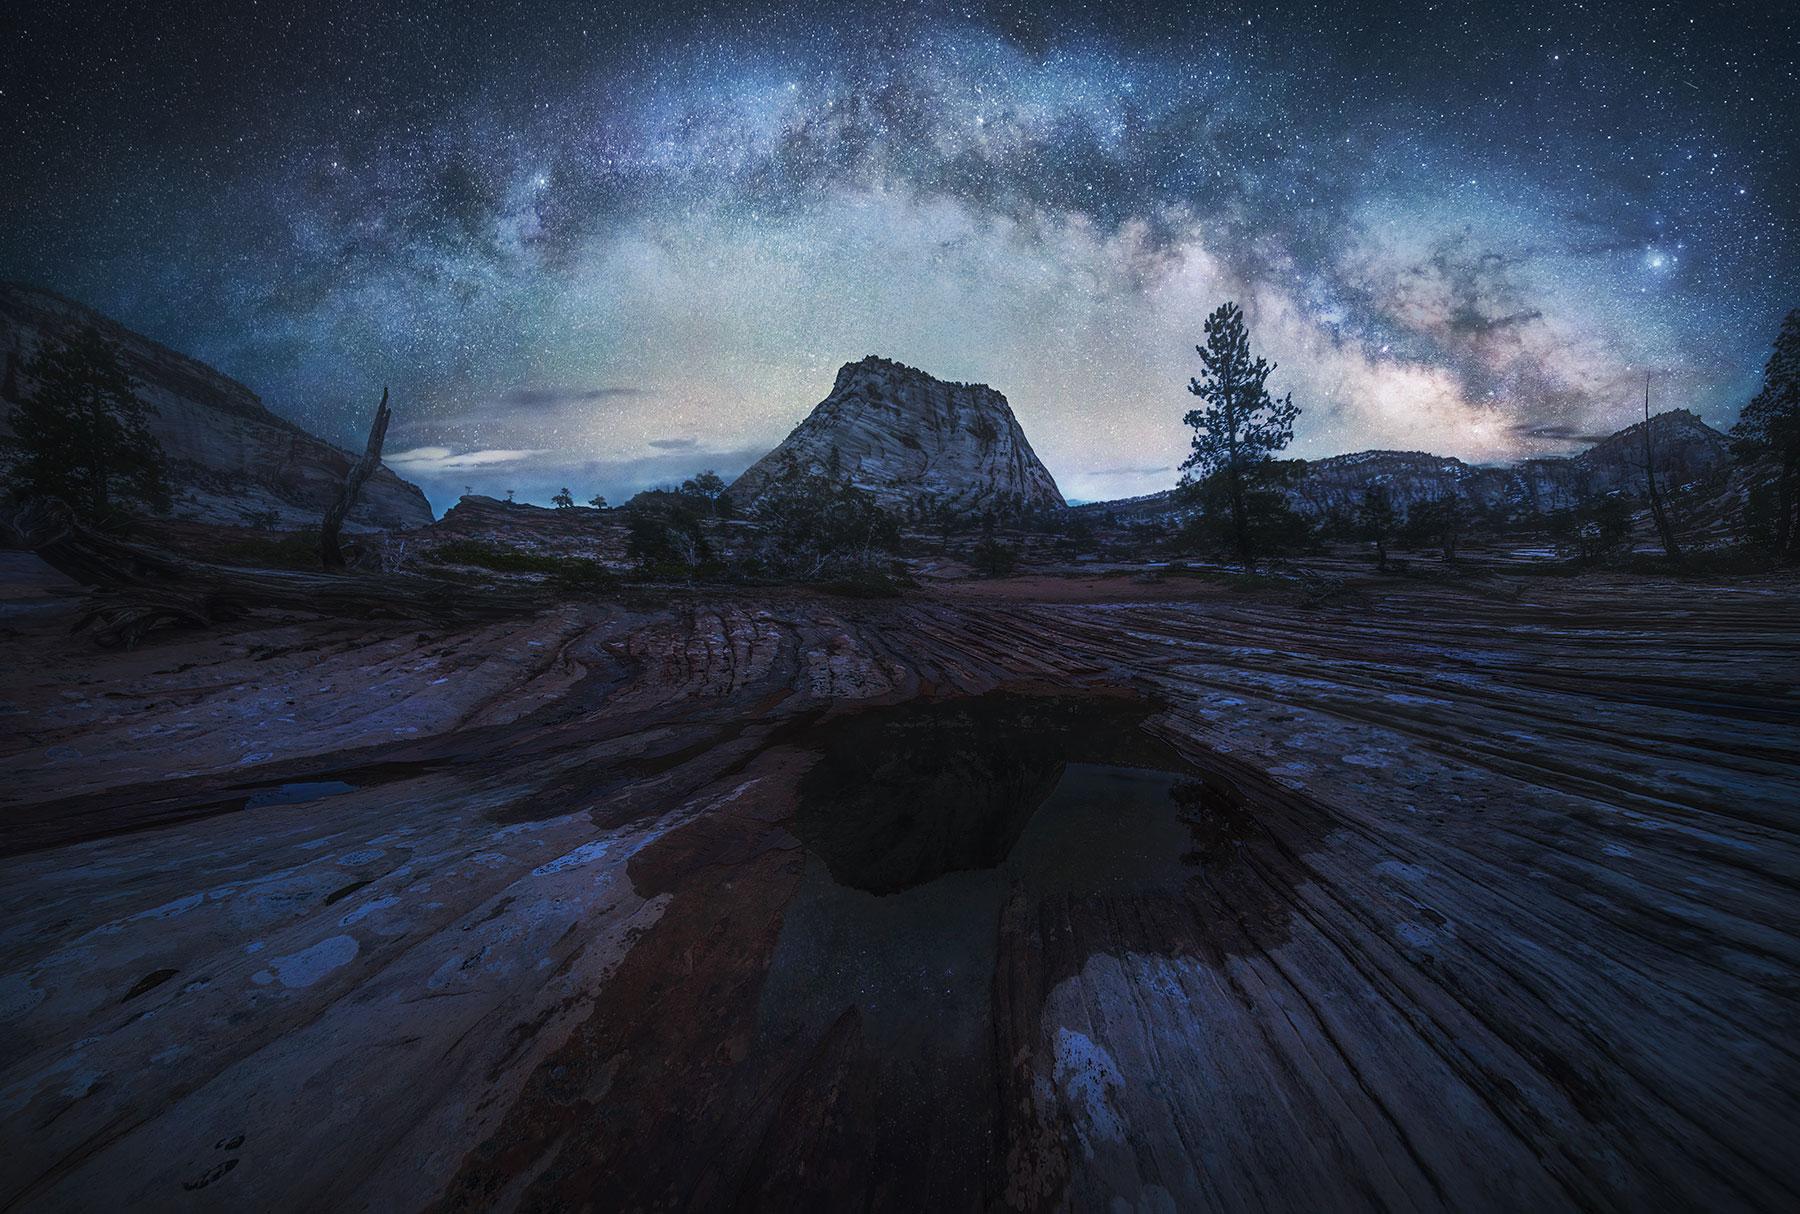 Sandstone, reflection, Milky Way, night, photo